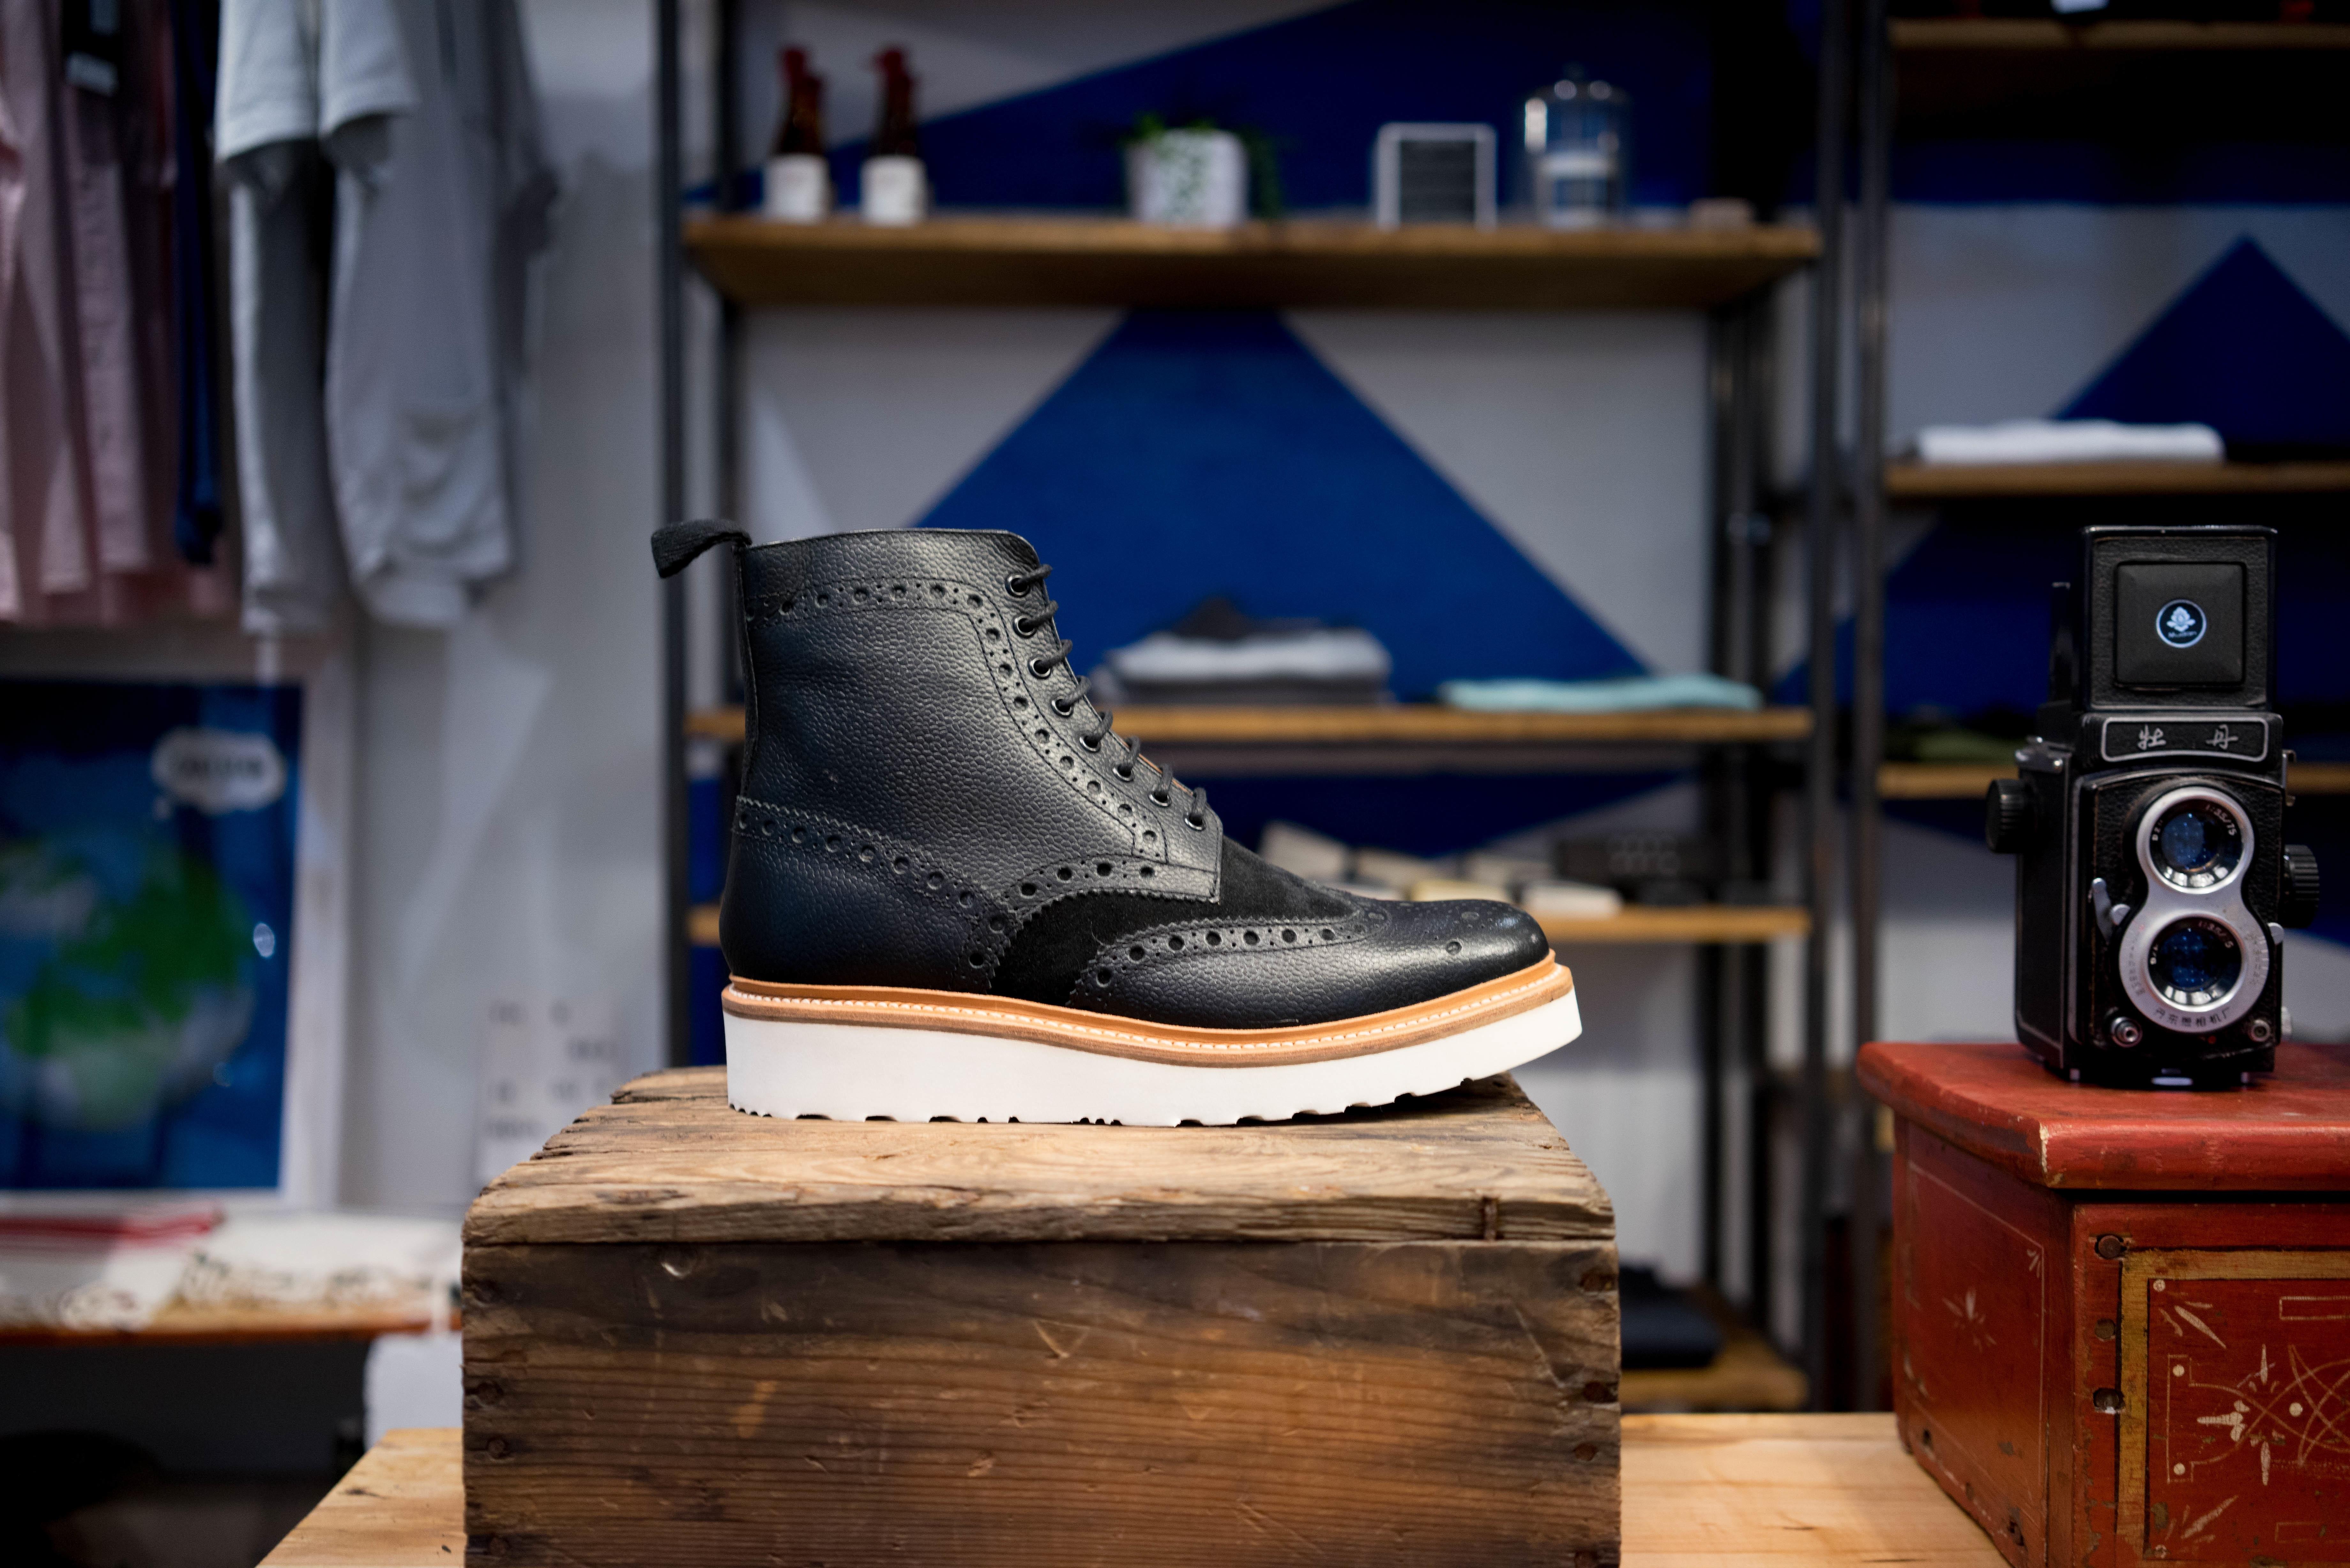 sepatu kayu kulit kamera Vintage Retro pedalaman pria sepatu bot toko warna mode biru kamar benda